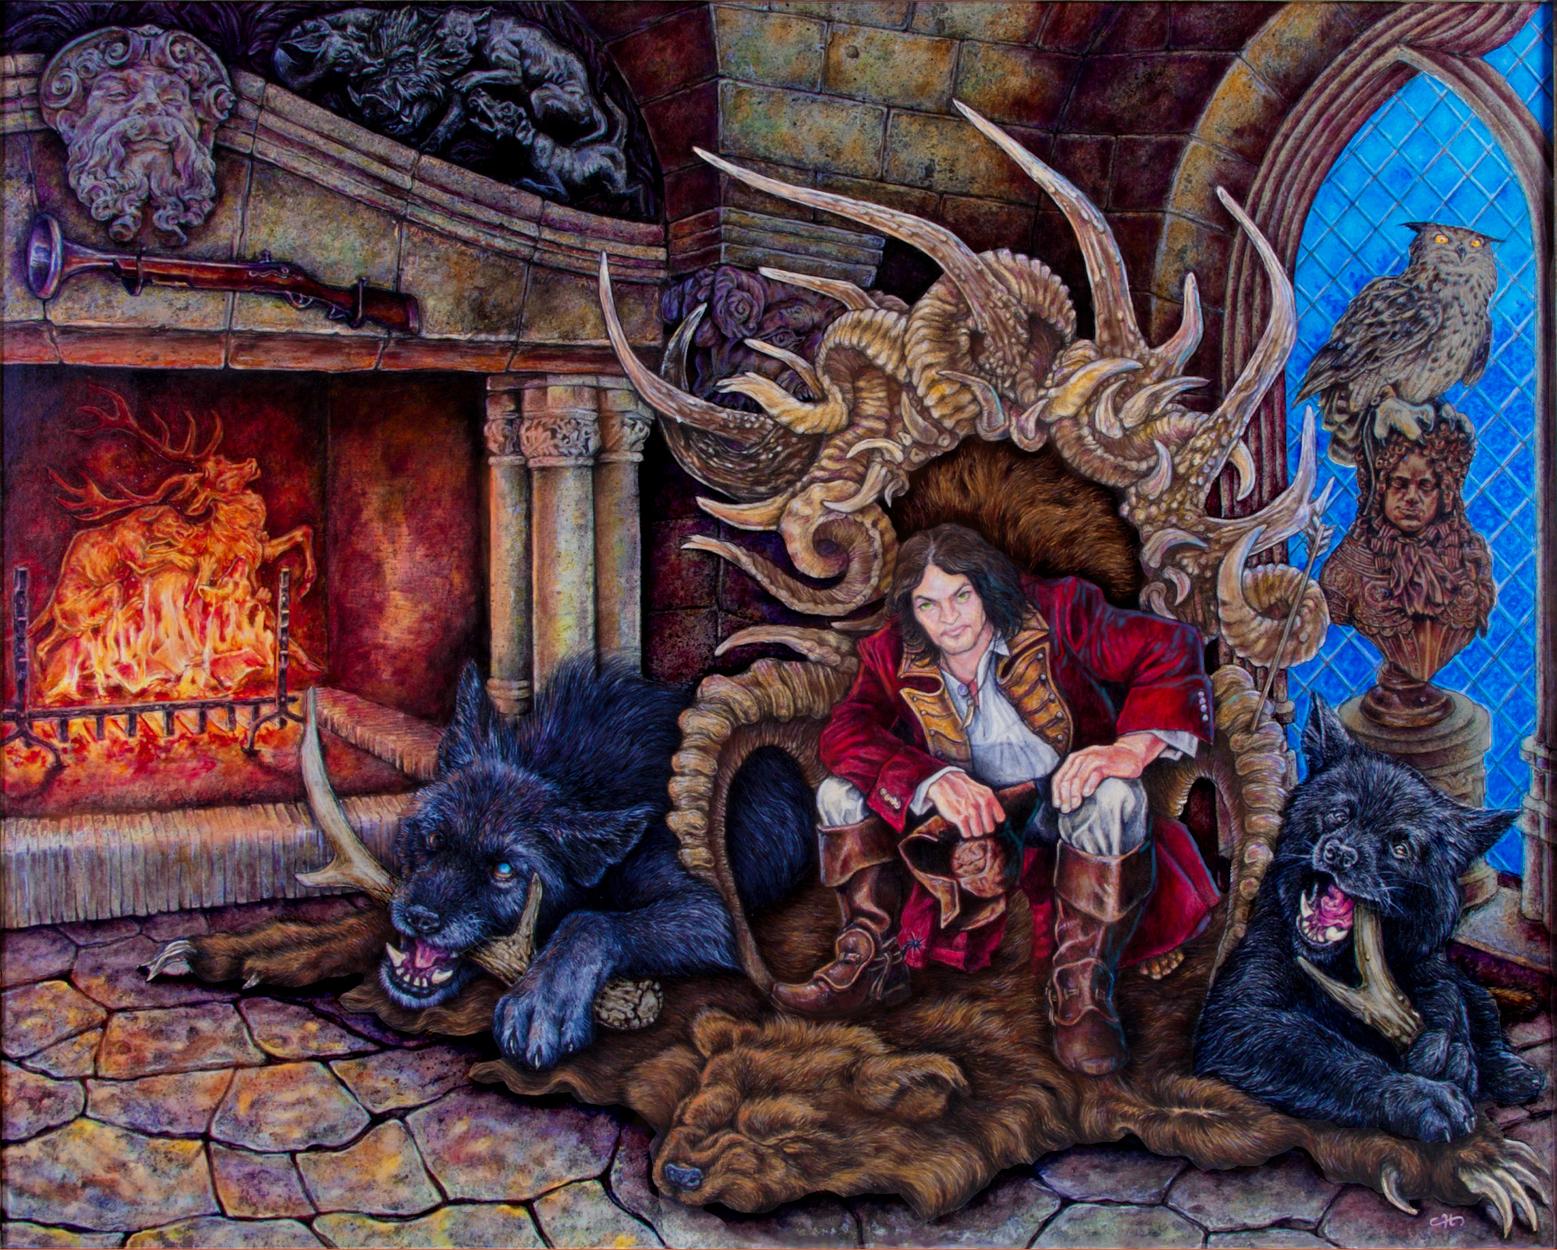 Night of the Hunter Artwork by Dan Chudzinski